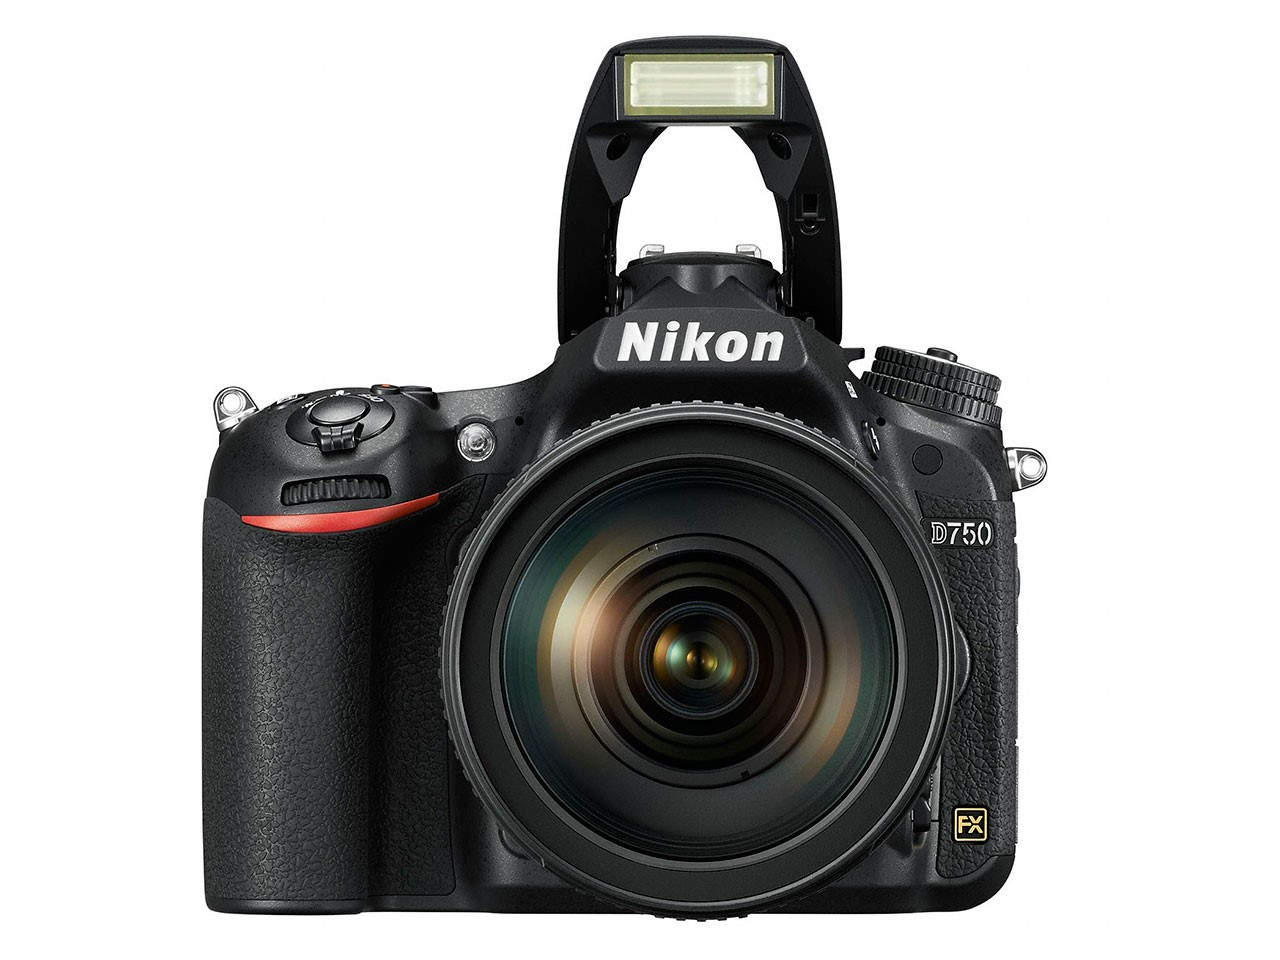 Какой фотоаппарат лучше — Nikon D750 или Canon EOS 5D Mark III